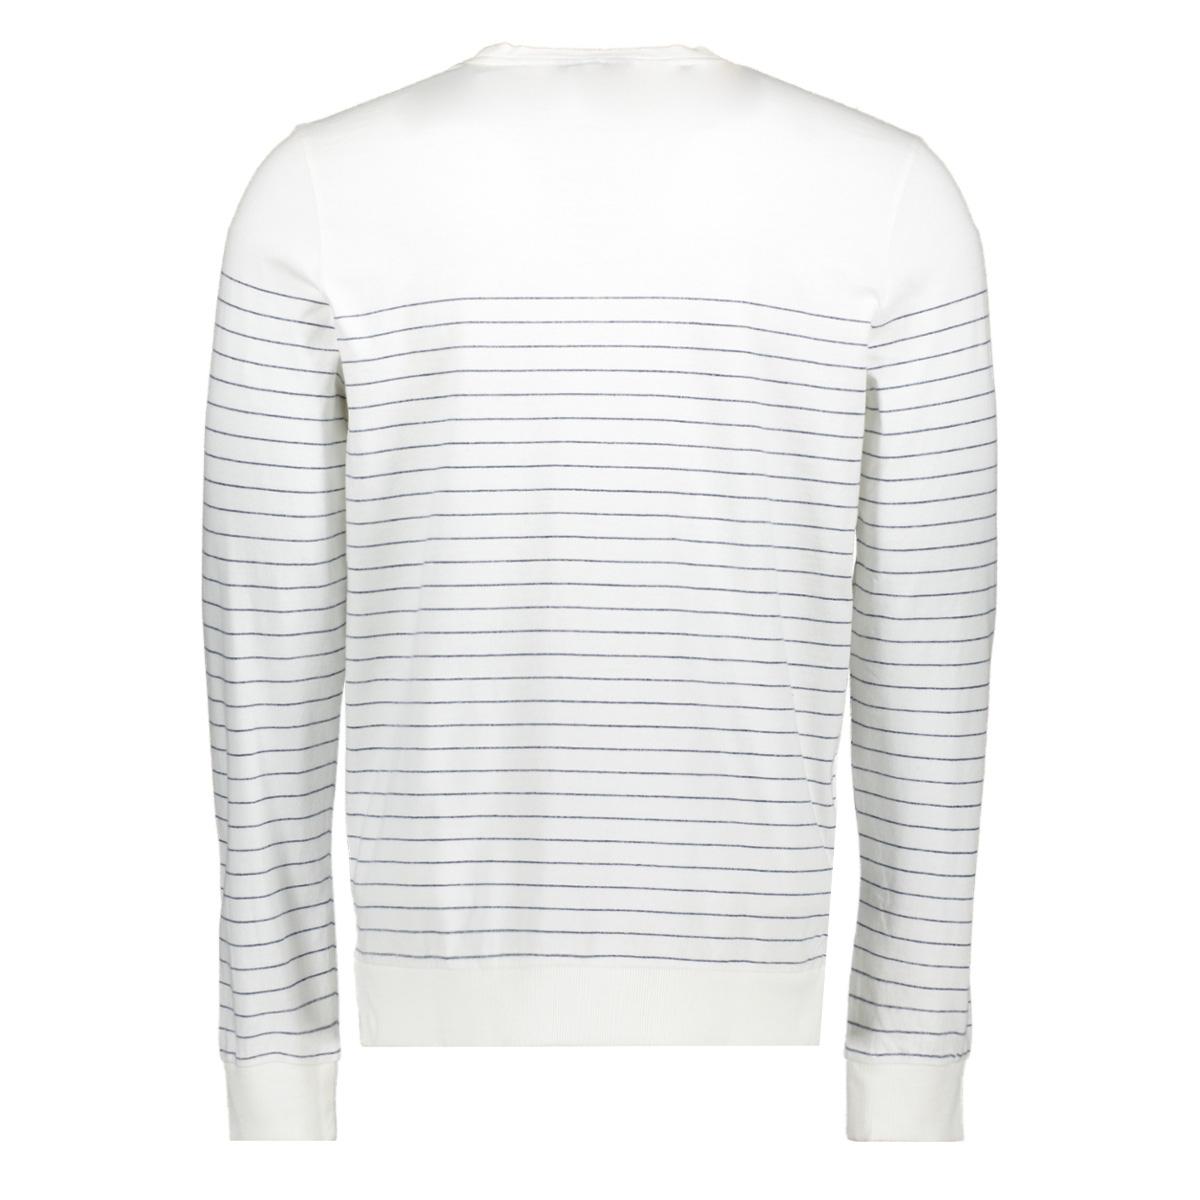 yarn dyed striped long sleeved t shirt pts201583 pme legend t-shirt 7003